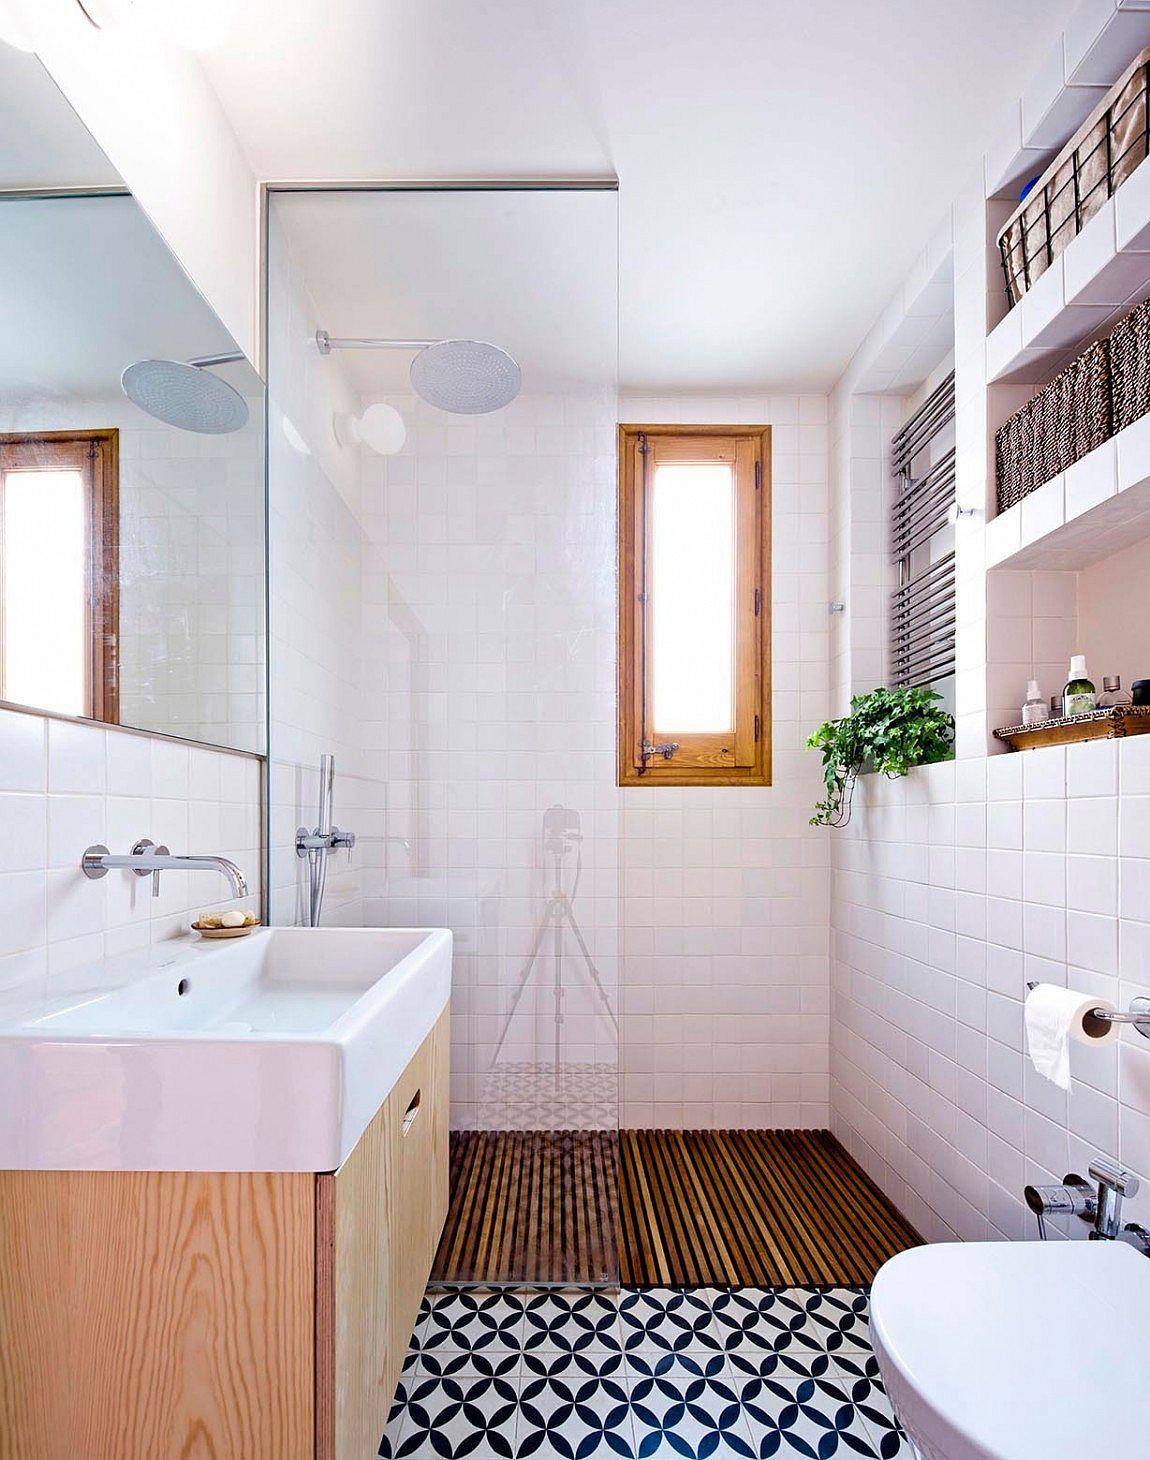 25 Tiny Apartment Bathroom Ideas that Maximize Space and ... on Bathroom Ideas For Apartments  id=65793